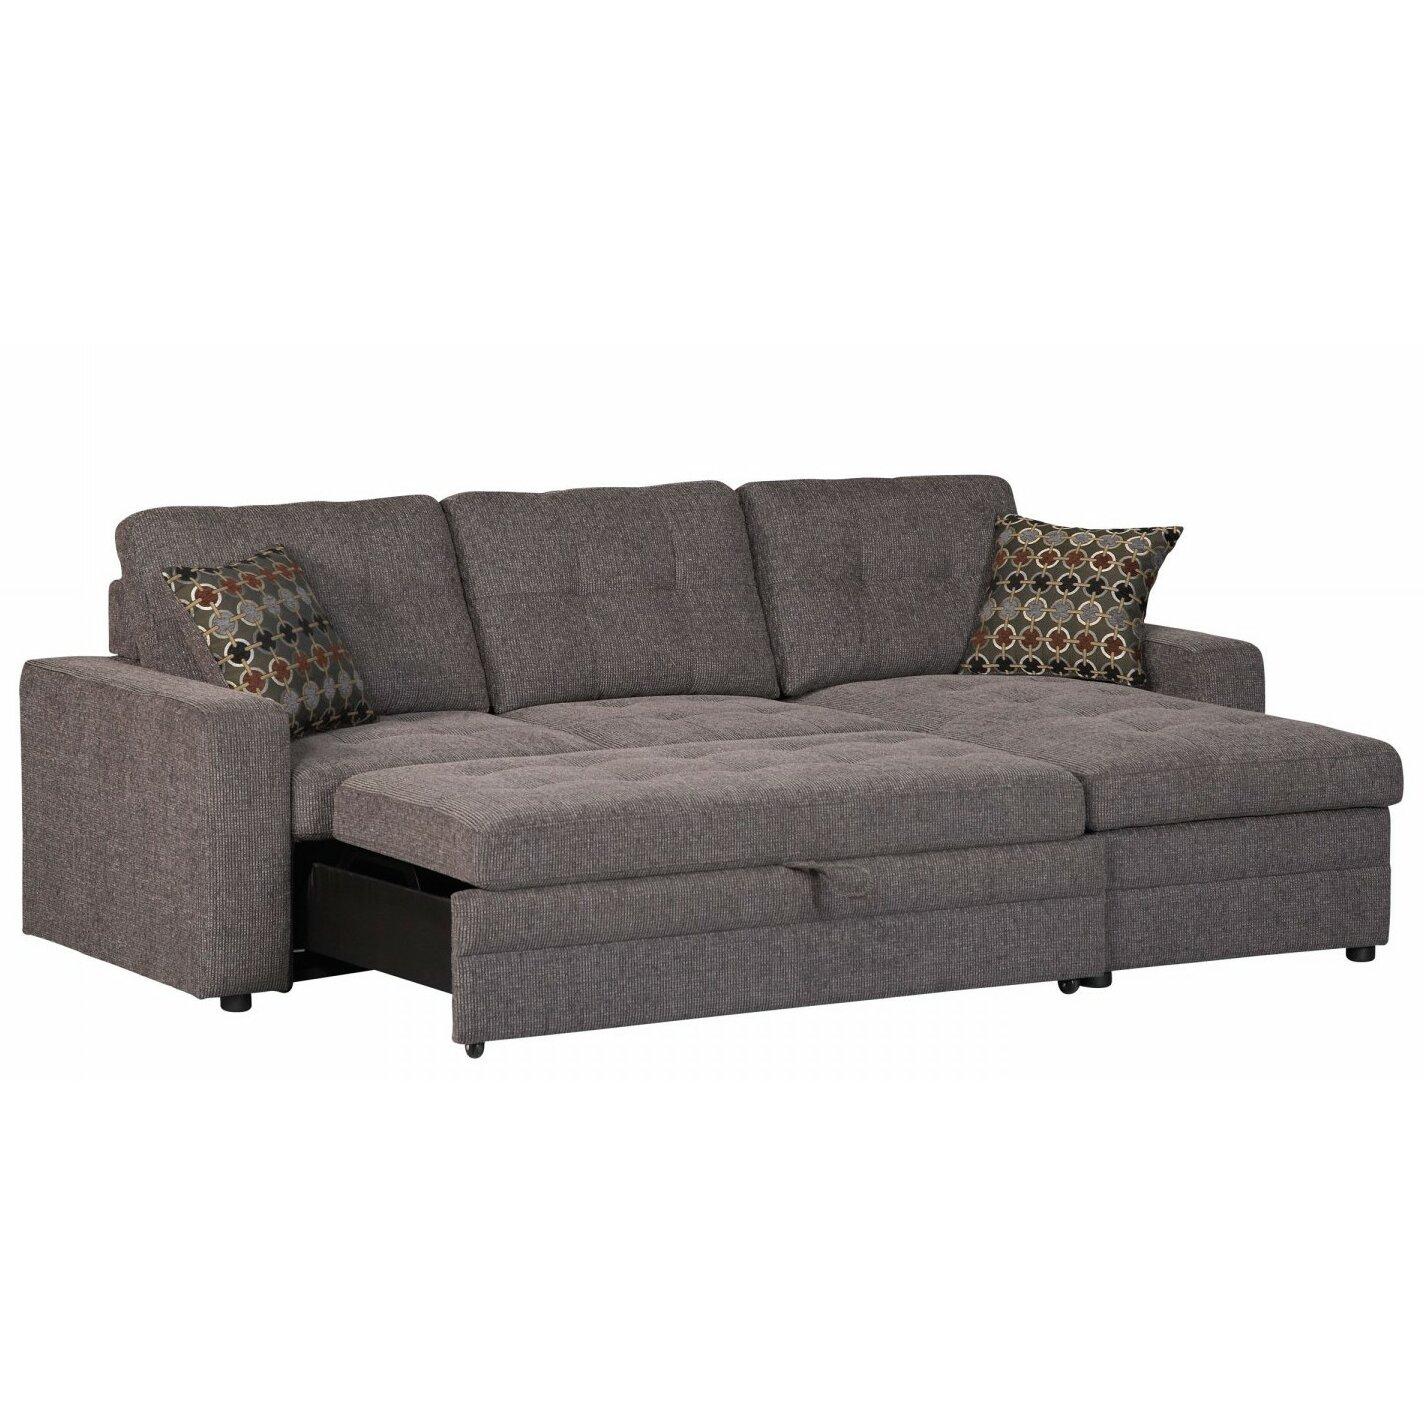 infini furnishings sleeper sectional reviews wayfair. Black Bedroom Furniture Sets. Home Design Ideas